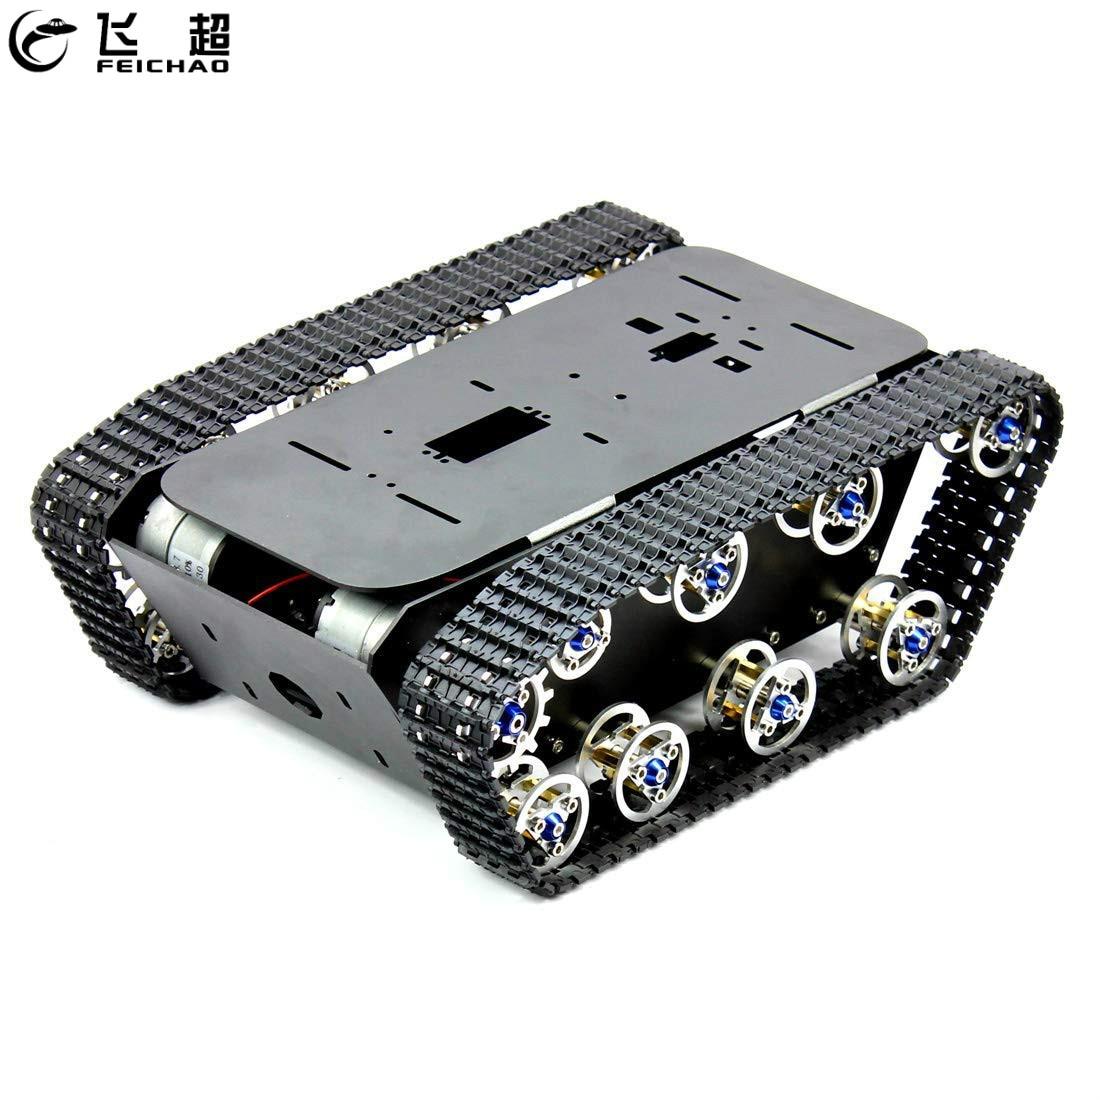 Smart Car Tank Robot Chassis Kit Aluminum Alloy Big Platform with Motors For DIY RC Robot Car Toys For Kids